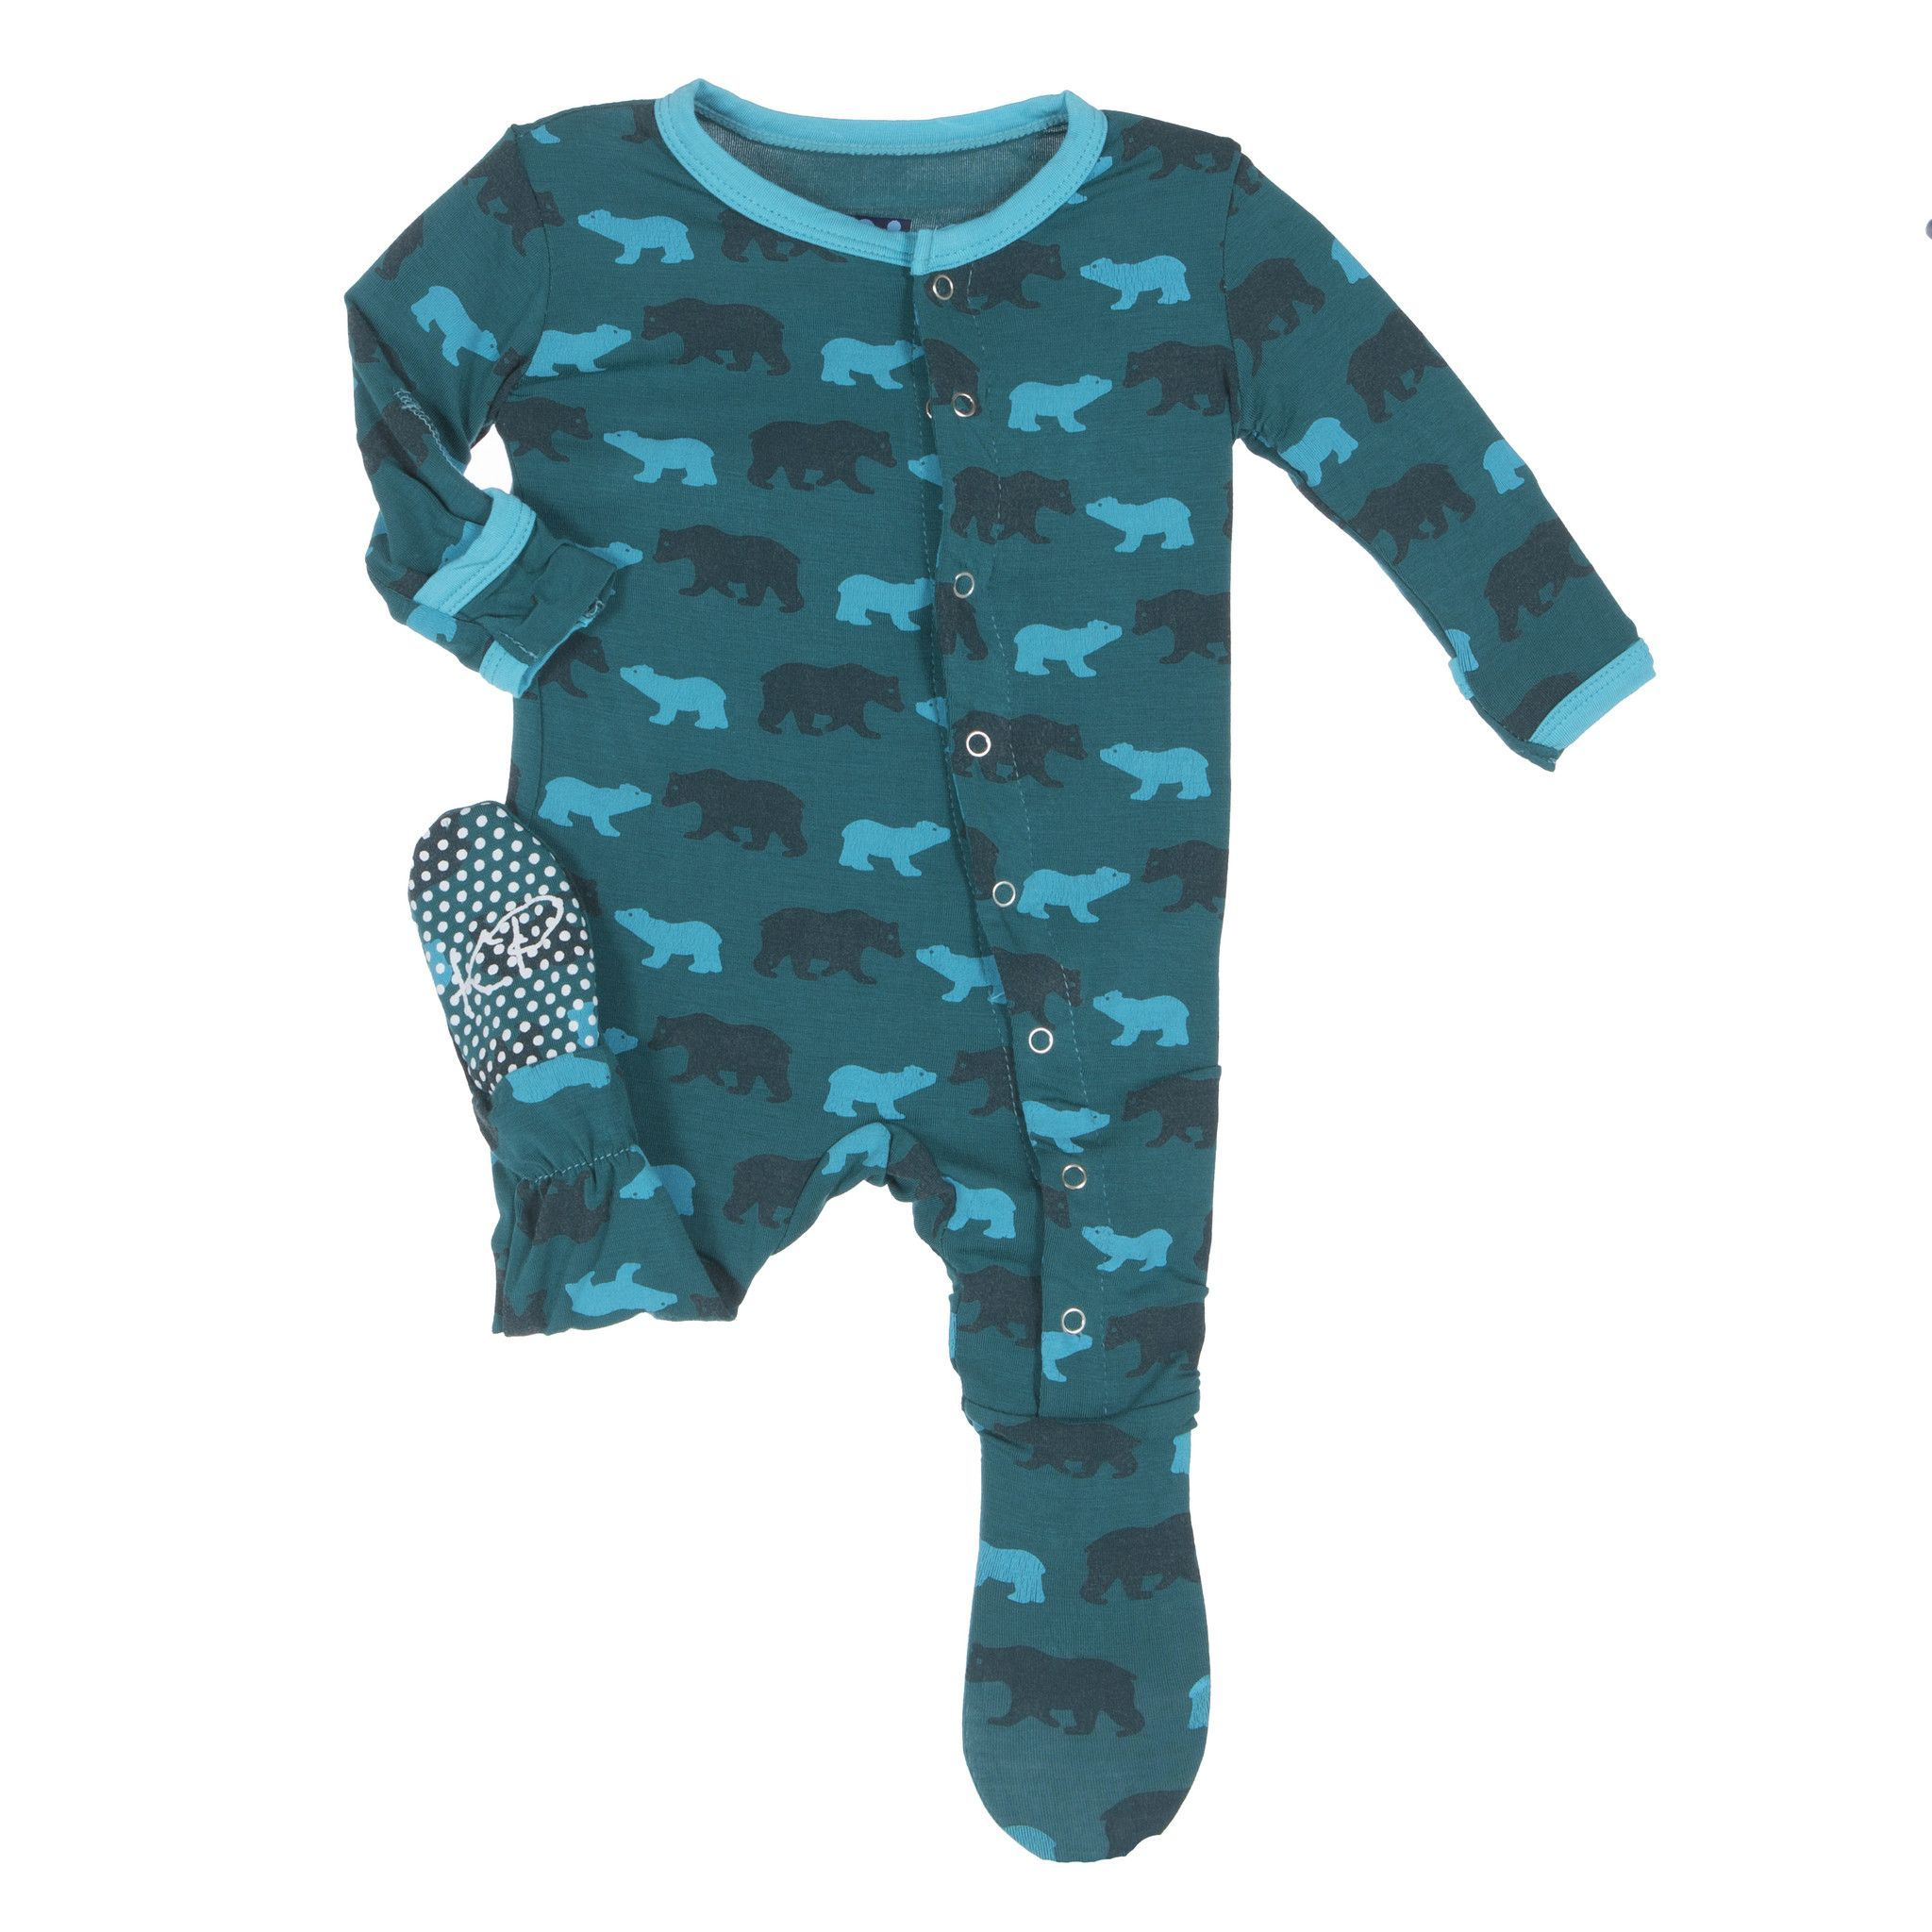 1a1a695d4 Kickee Pants Tropical Life Print Footie Pajamas | Kickee Pants ...